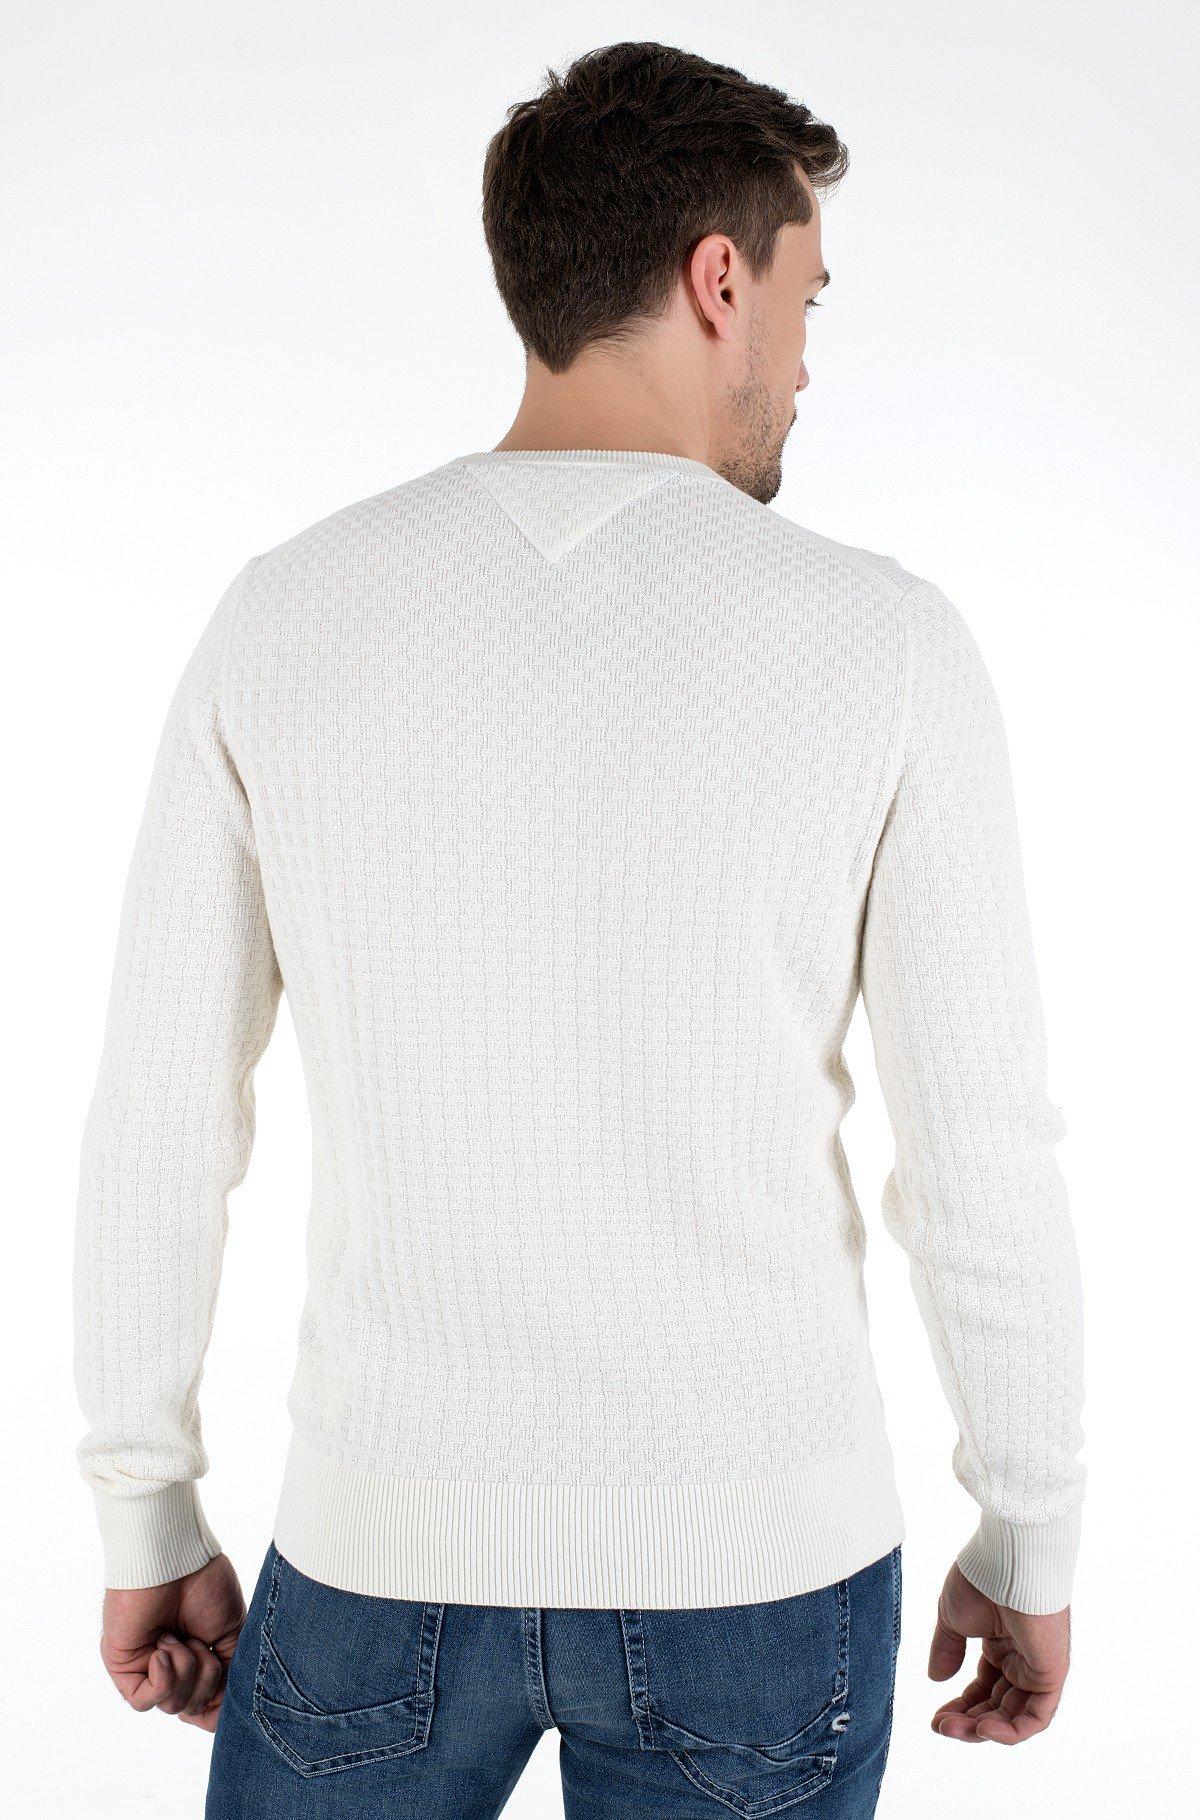 Knitwear WEAVE STRUCTURED SWEATER-full-2